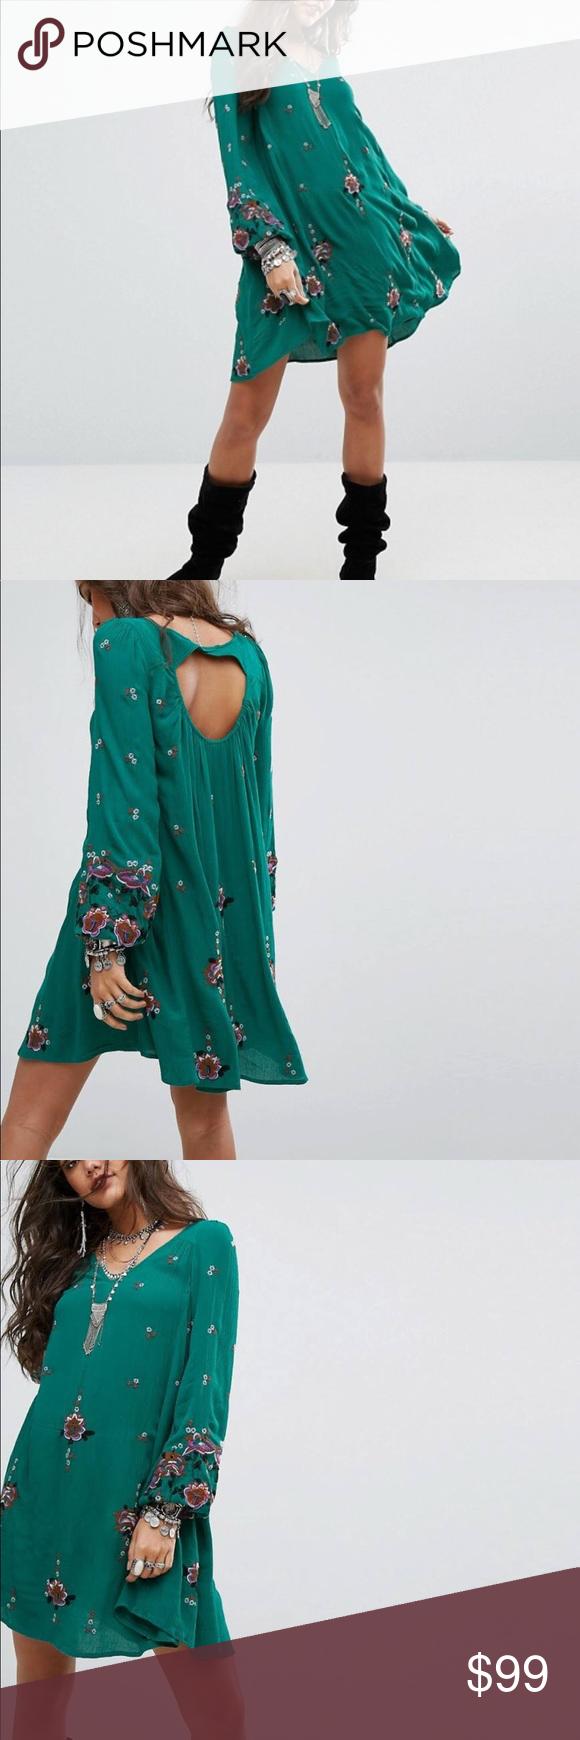 199db81814 Free People Oxford Embroidered Mini Dress Green NWT